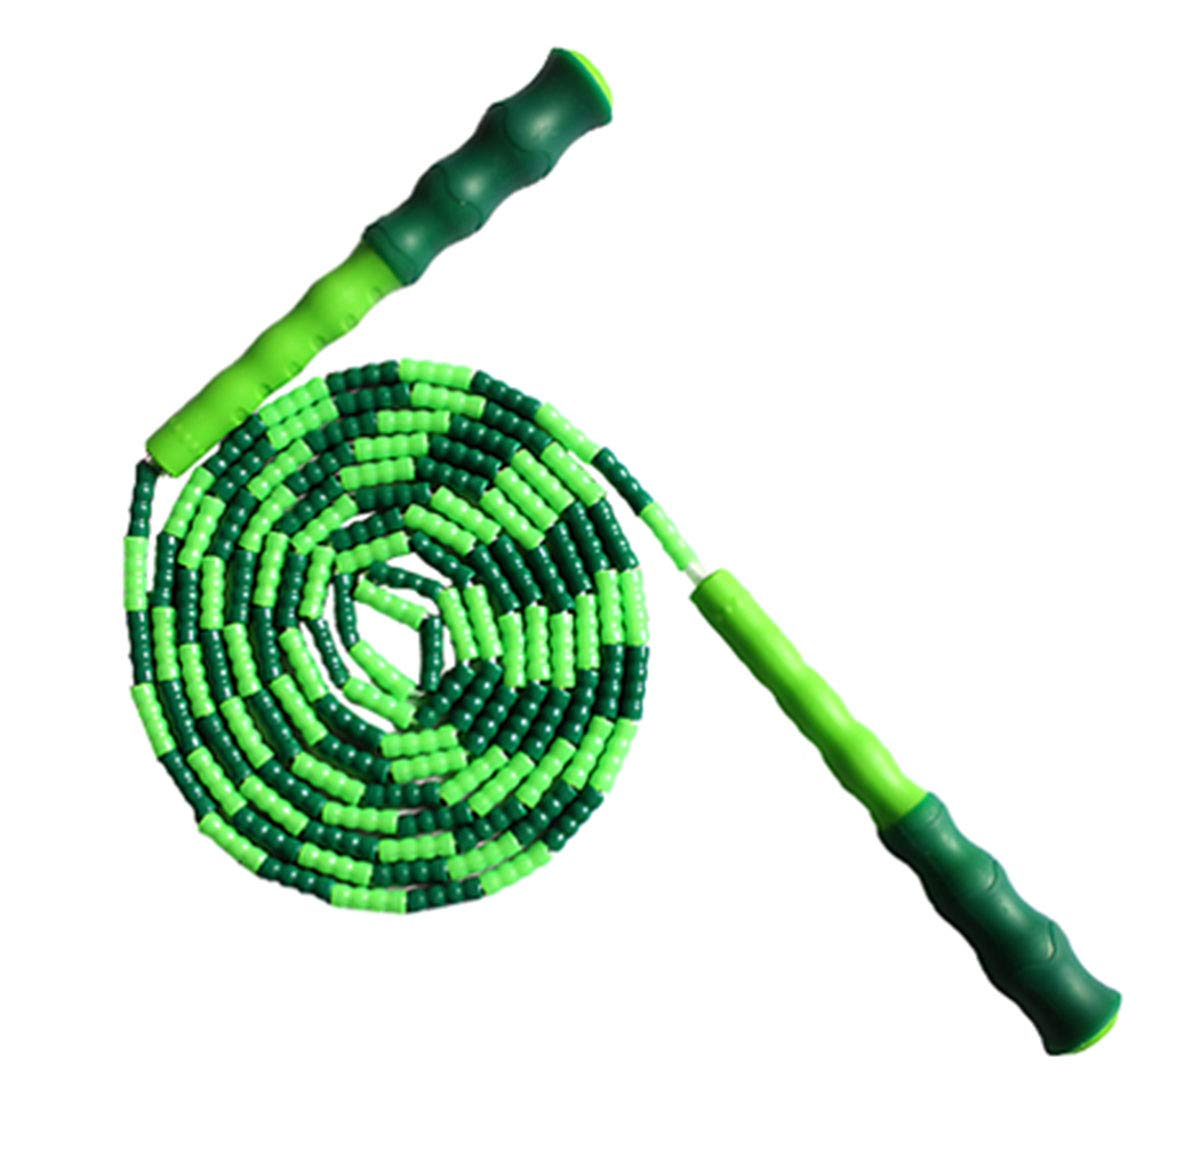 LETUSPORT 9 Feet Adjustable Beaded Segmented Jump Rope for Women Men Kids Lightweight Work Out Speed Jumping Ropes (Green, 1 pcs)